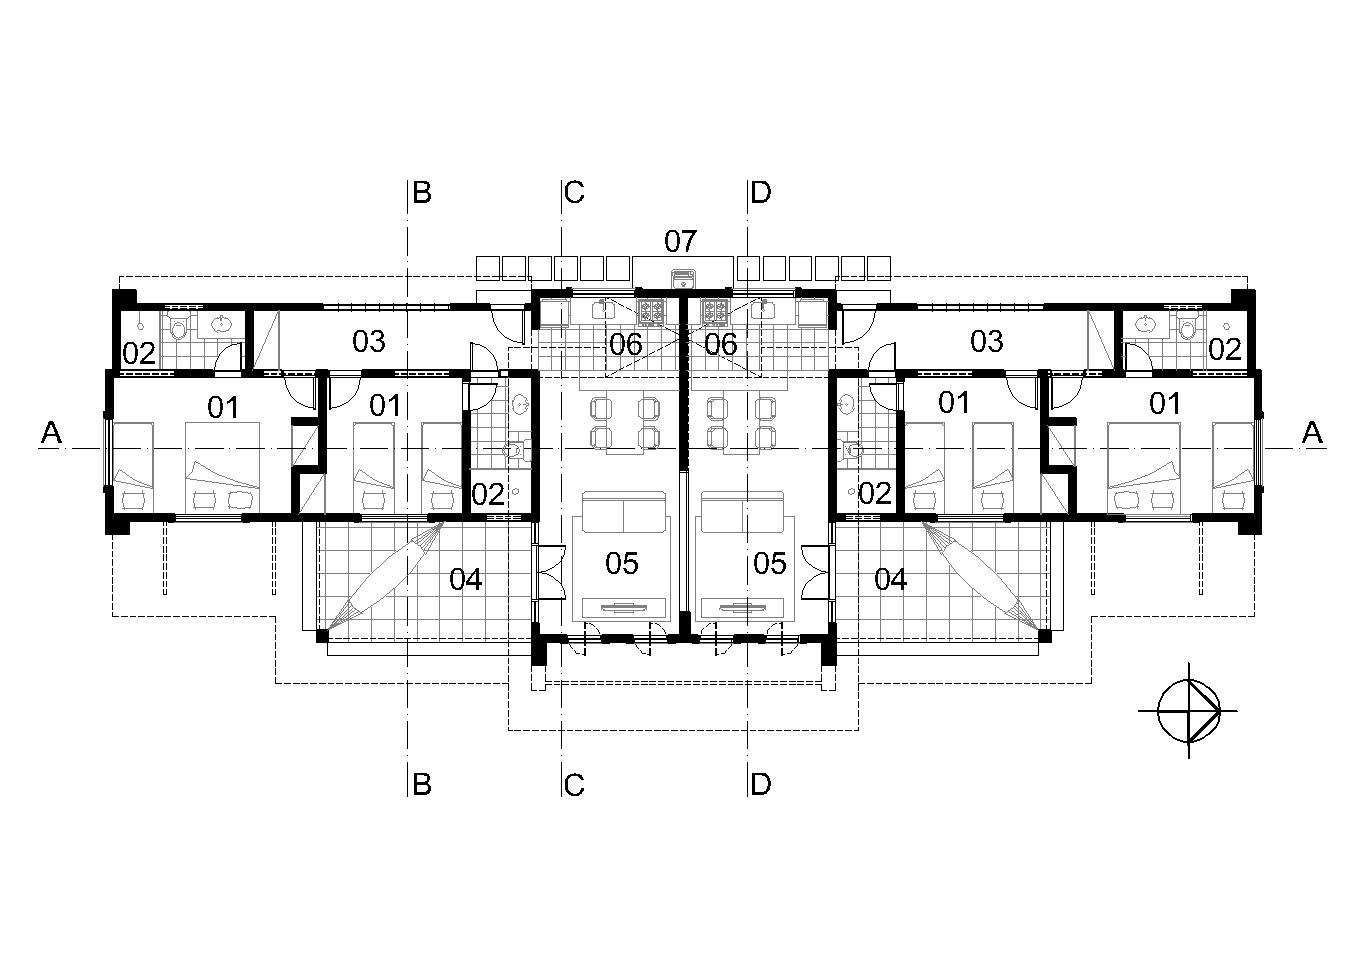 plantas baixas de casas populares Planta Baixa de Casas Pequenas  #121212 1362 962